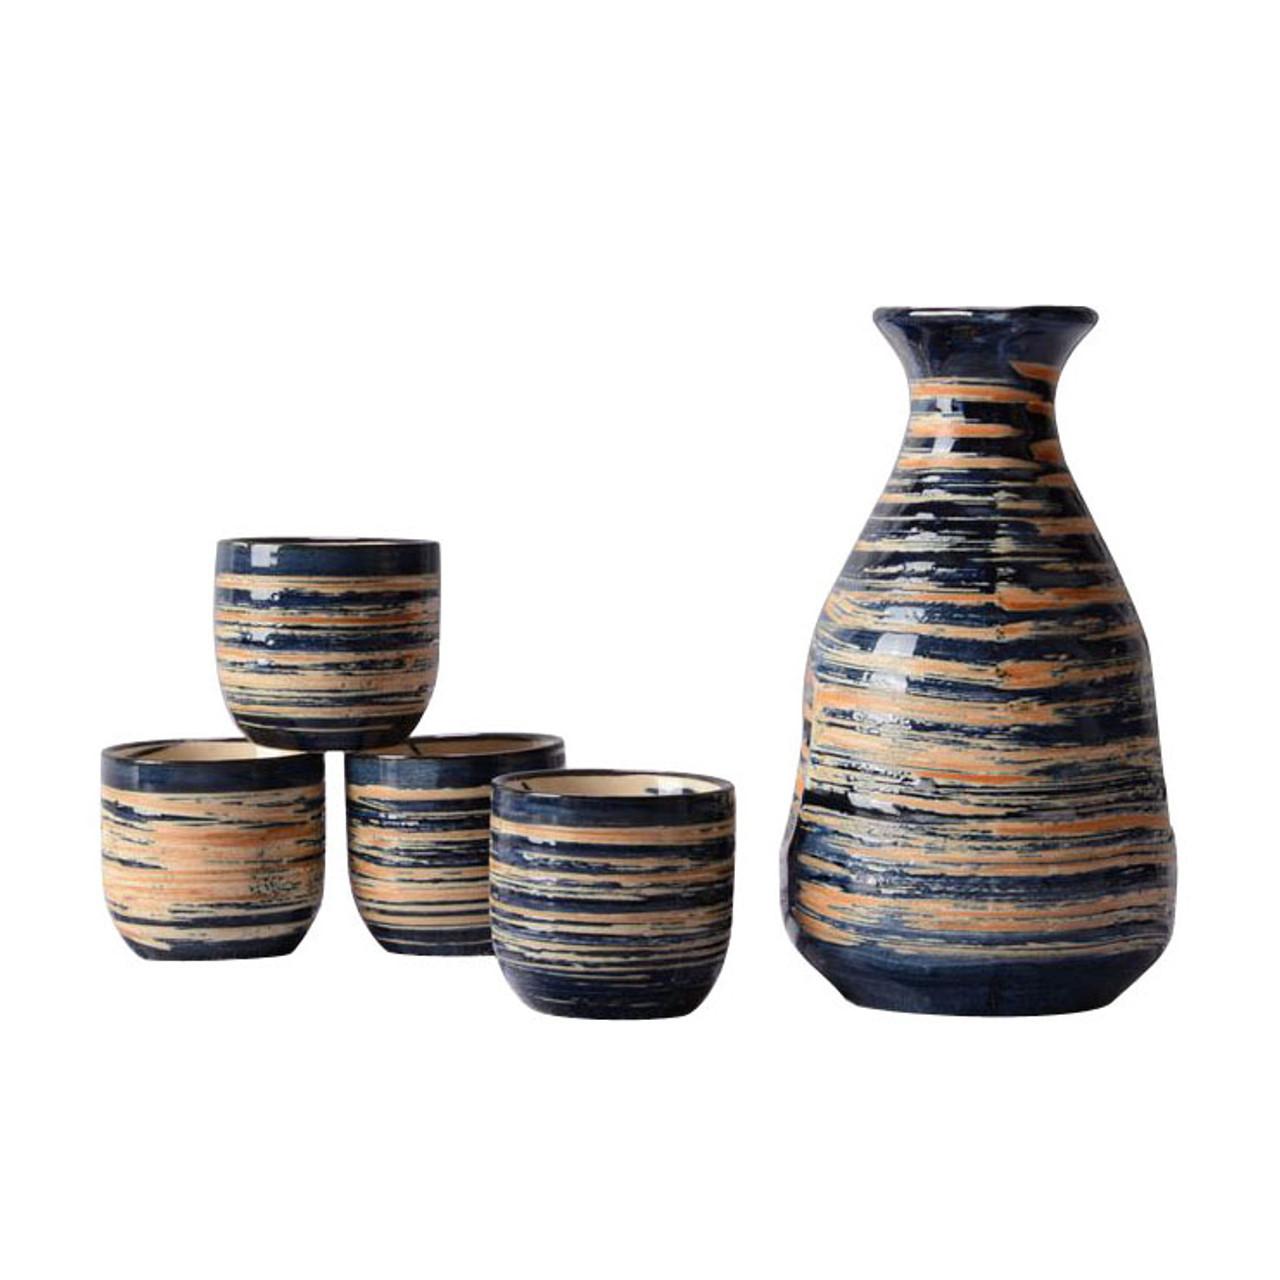 Japanese sake set in black glaze design